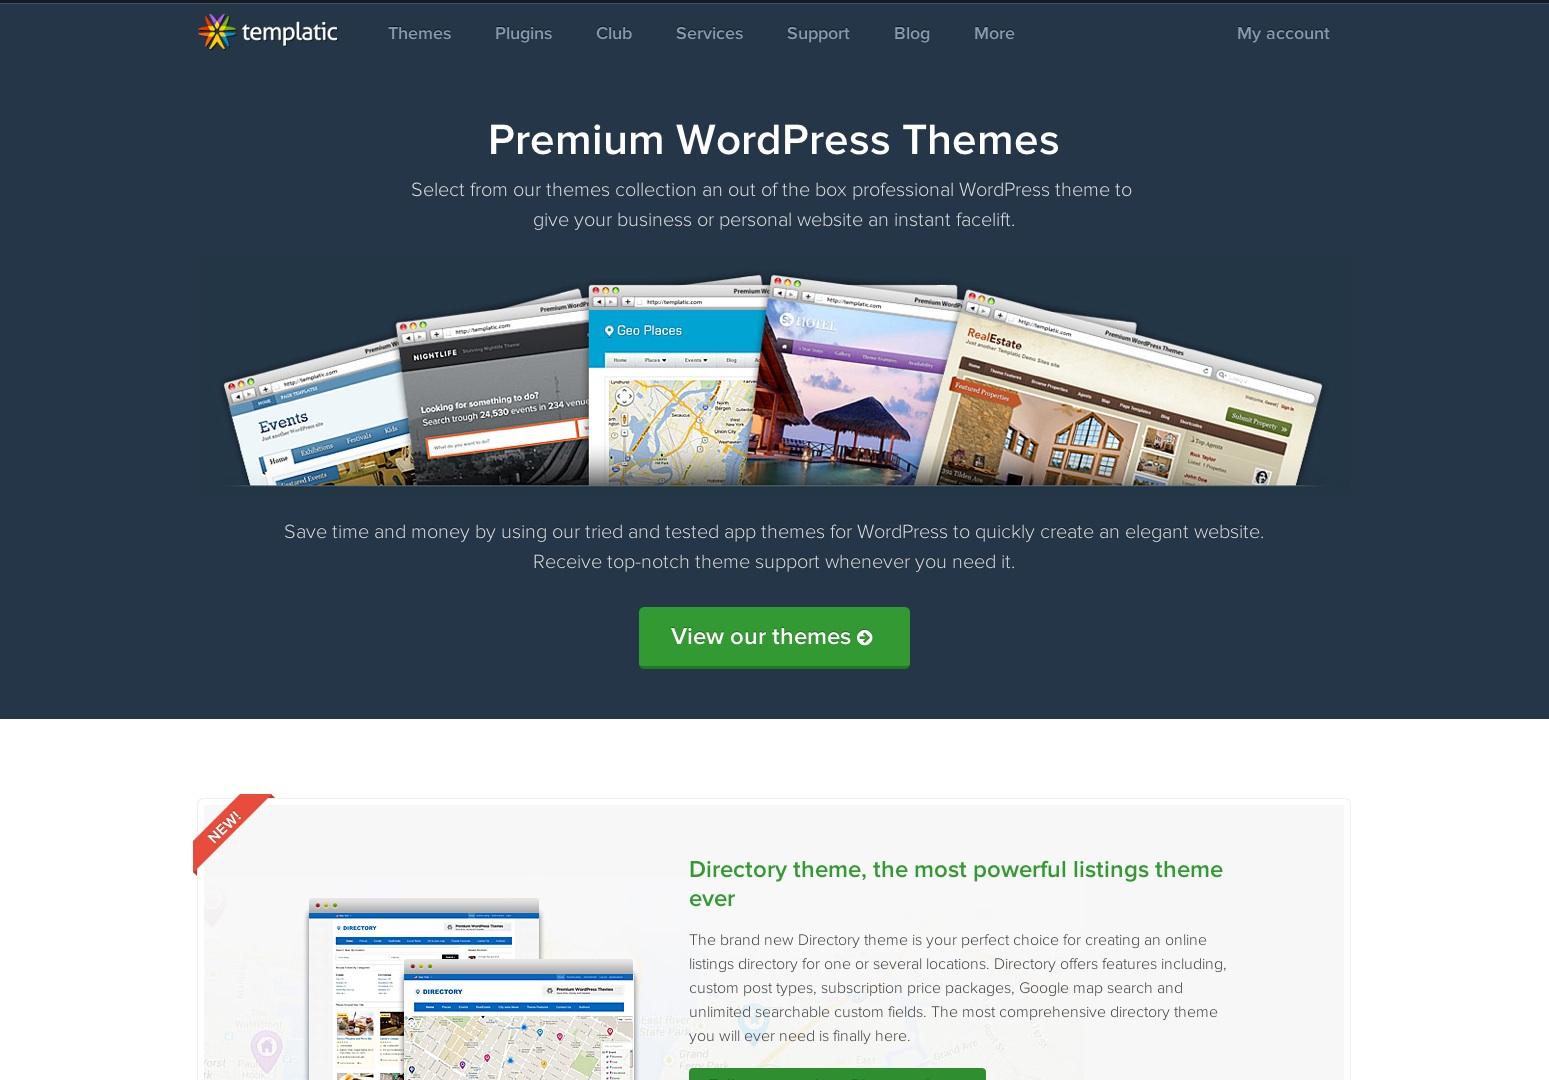 Premium WordPress Themes | Templatic - App Themes | Directory Themes